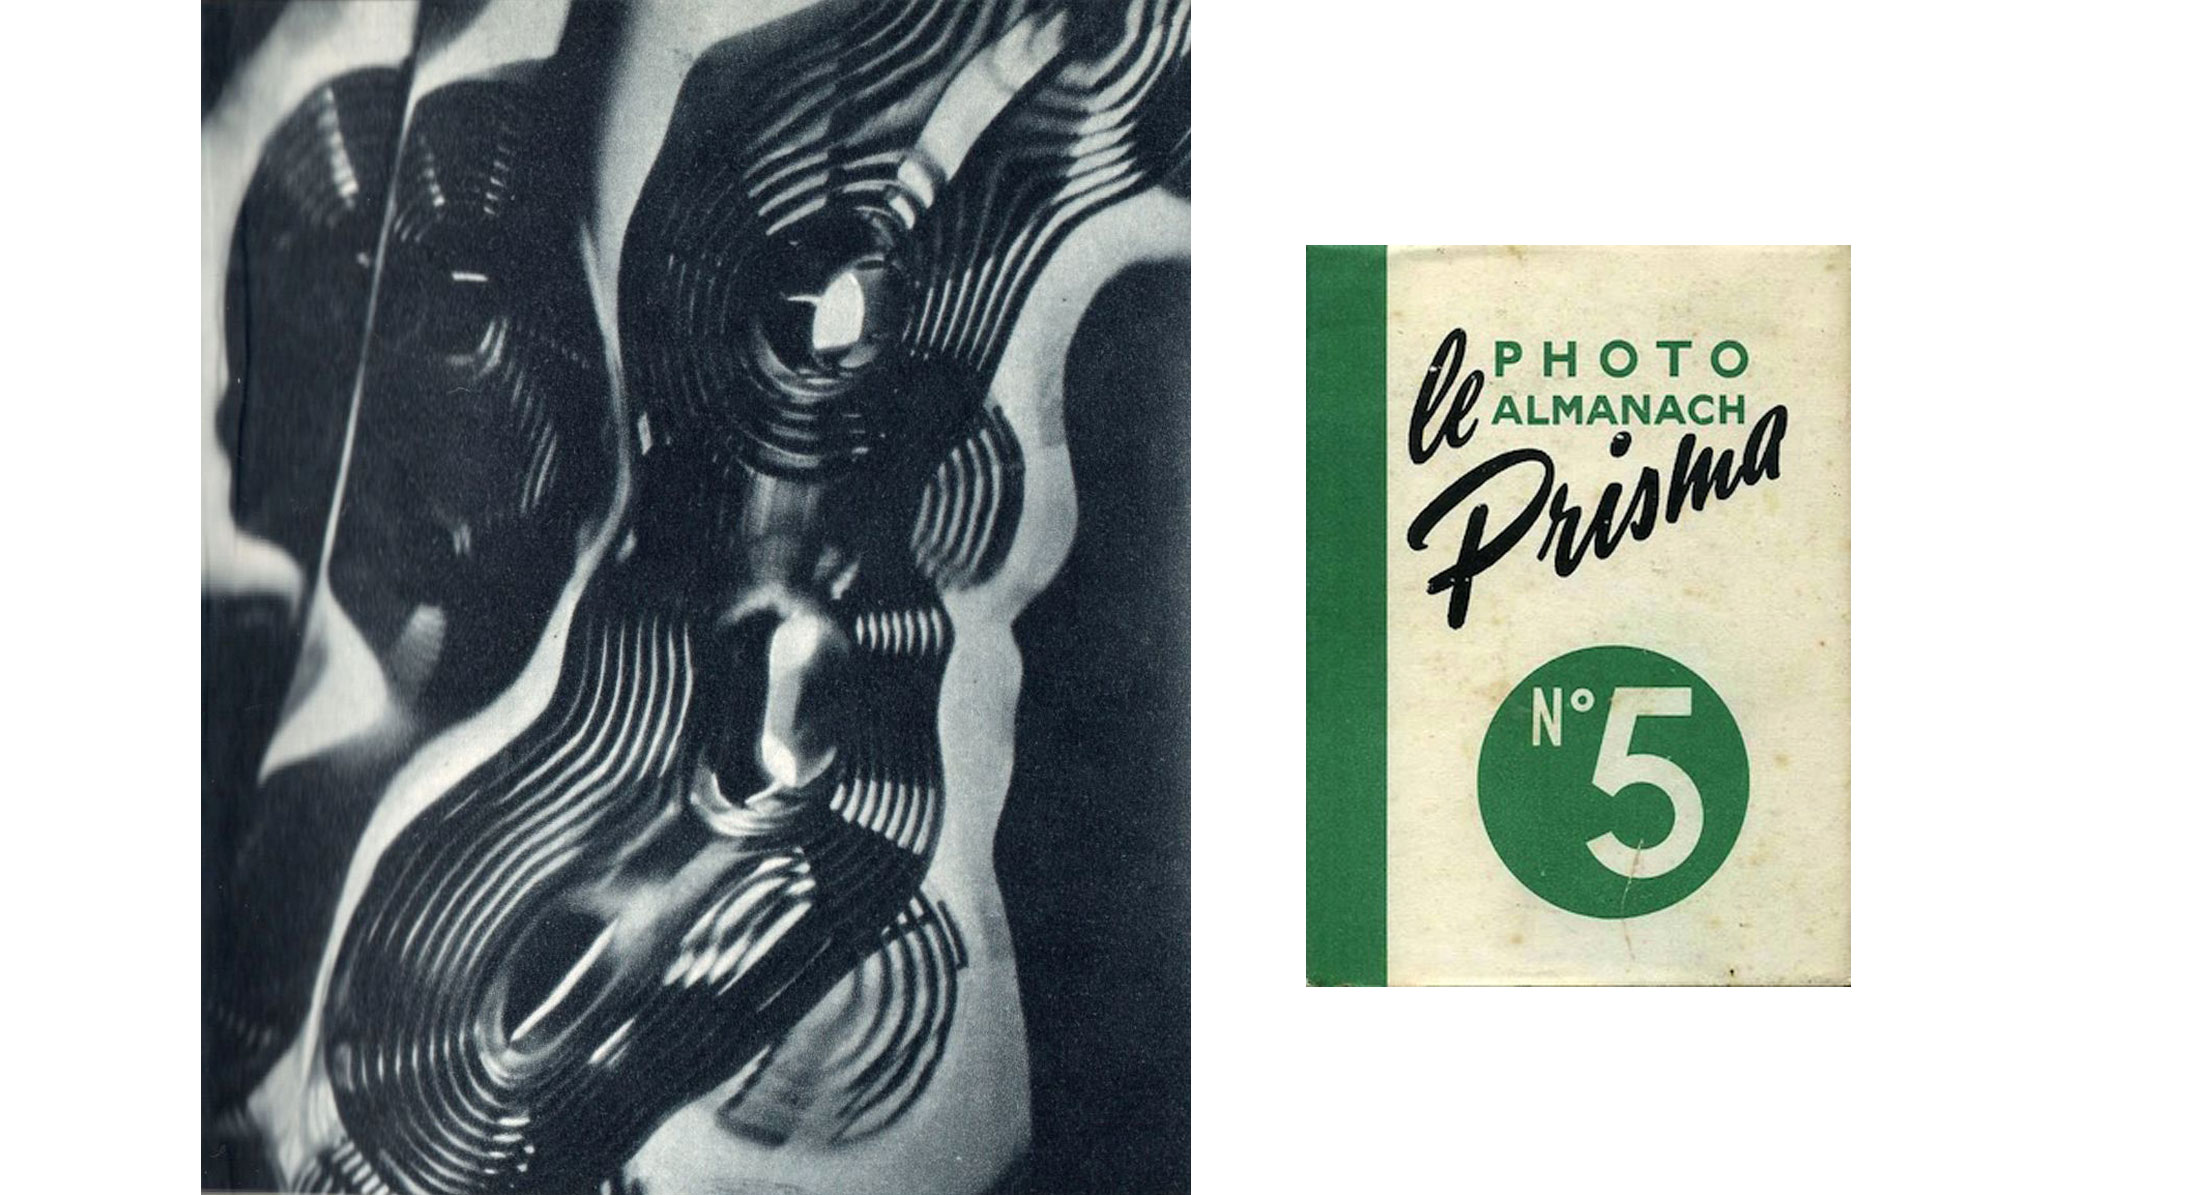 Raymond-Hains-graphisme-et-photographie-magazine-prisma-5-photographie-hypnagogique-05